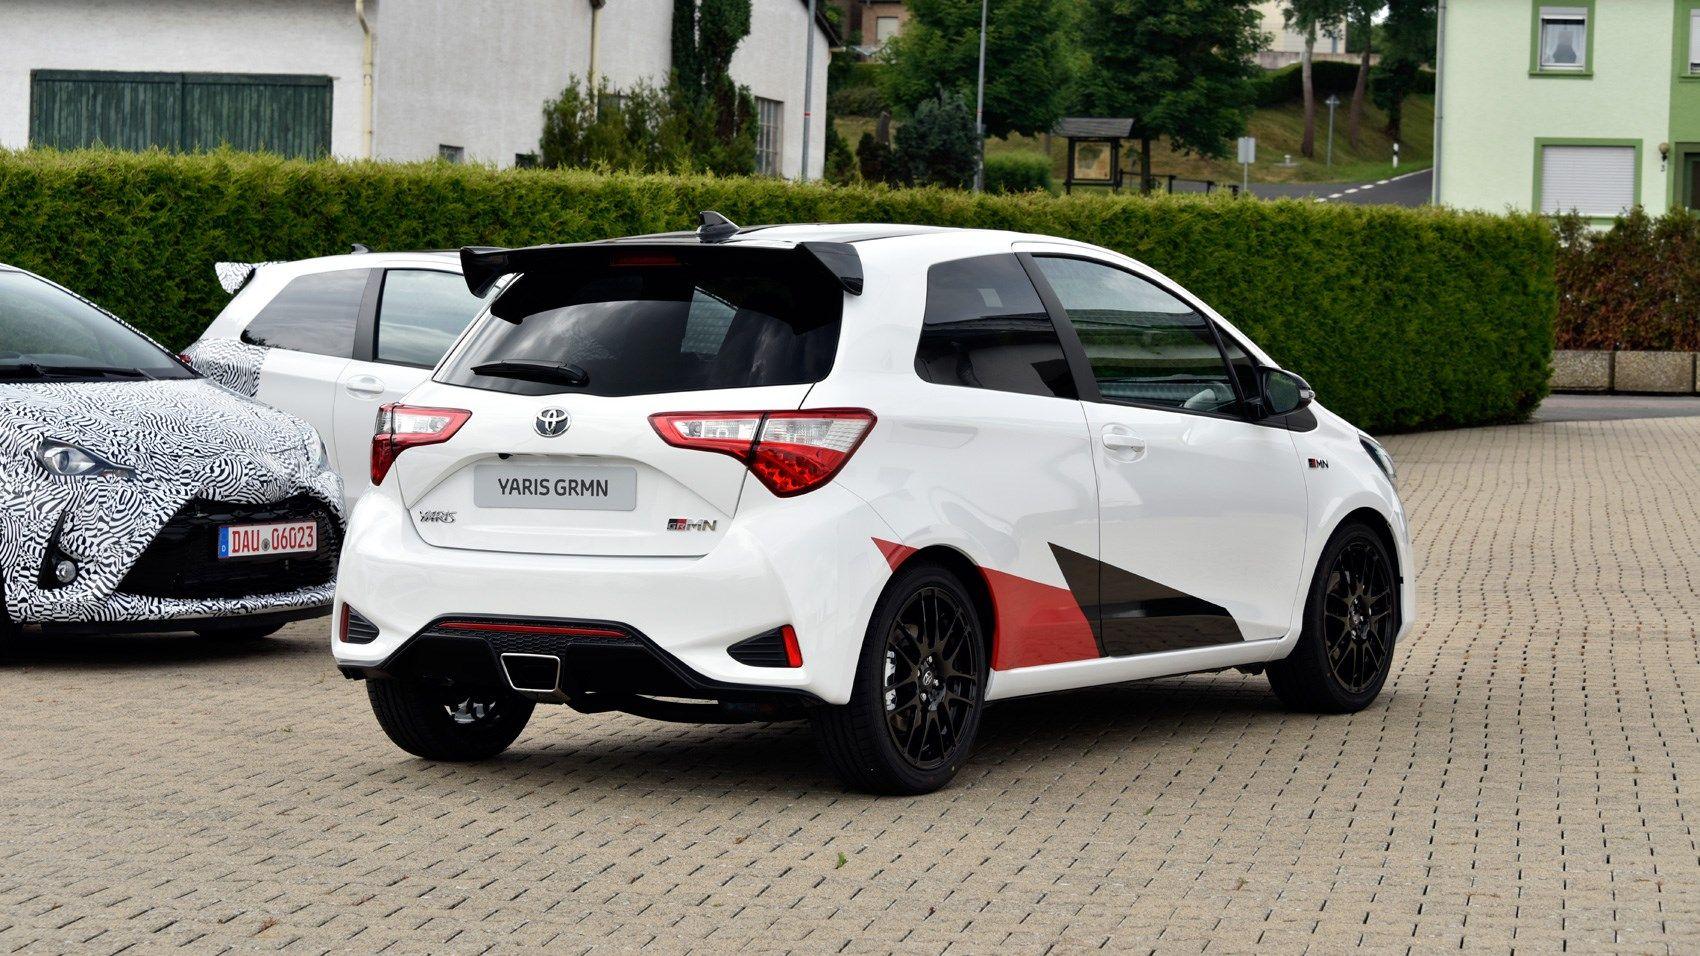 Toyota yaris 2017 review yaris toyota toyota yaris 2017 review yaris toyota pinterest toyota